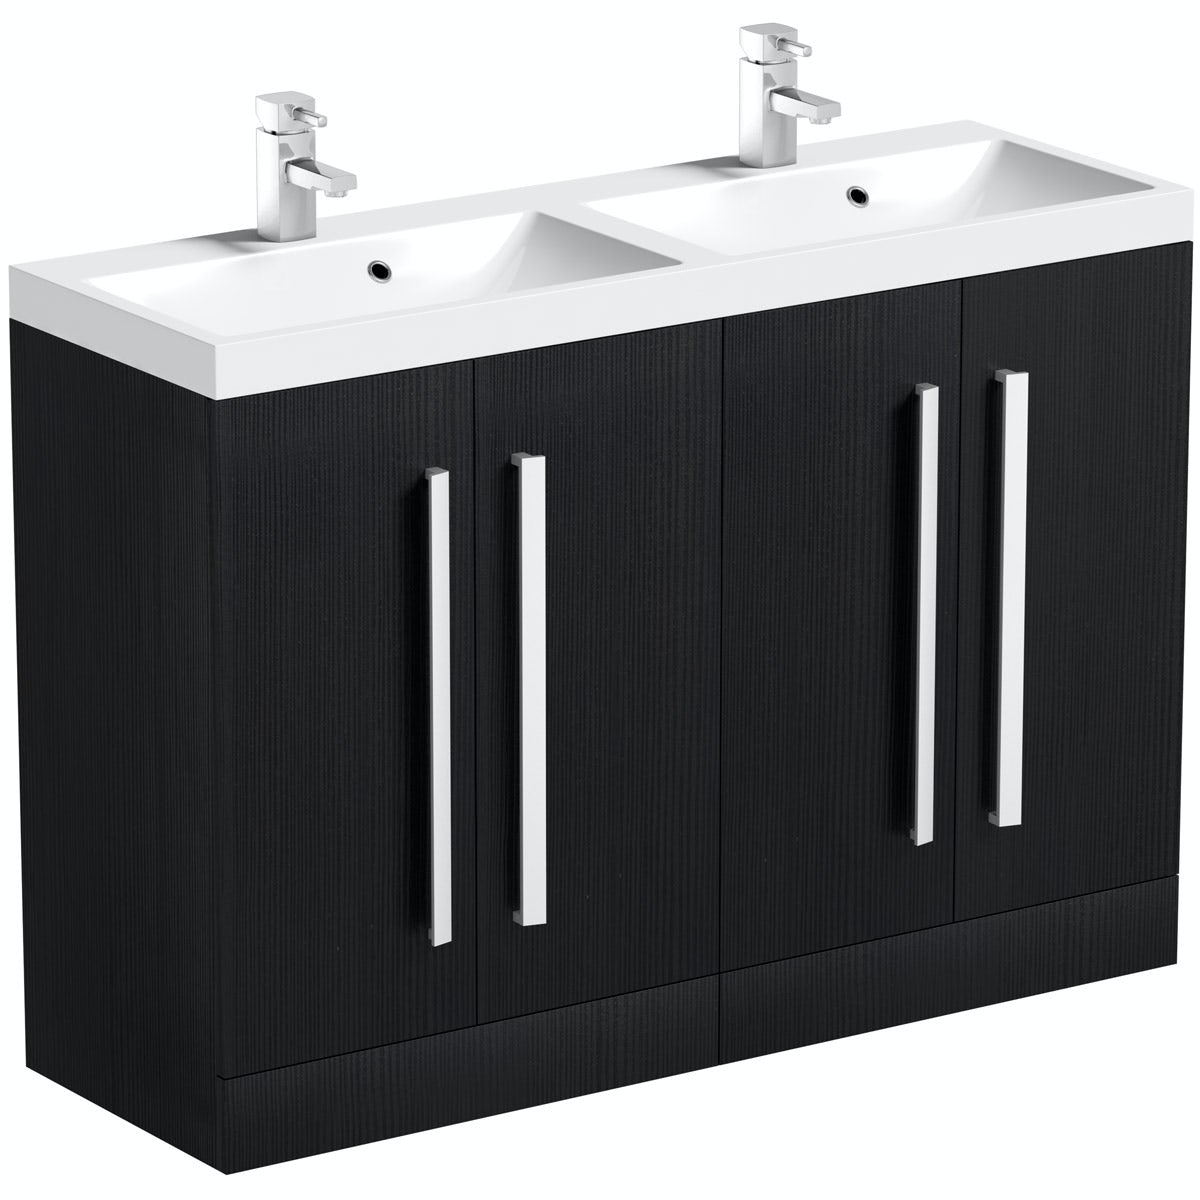 Orchard Wye essen black floorstanding double vanity unit and basin 1200mm